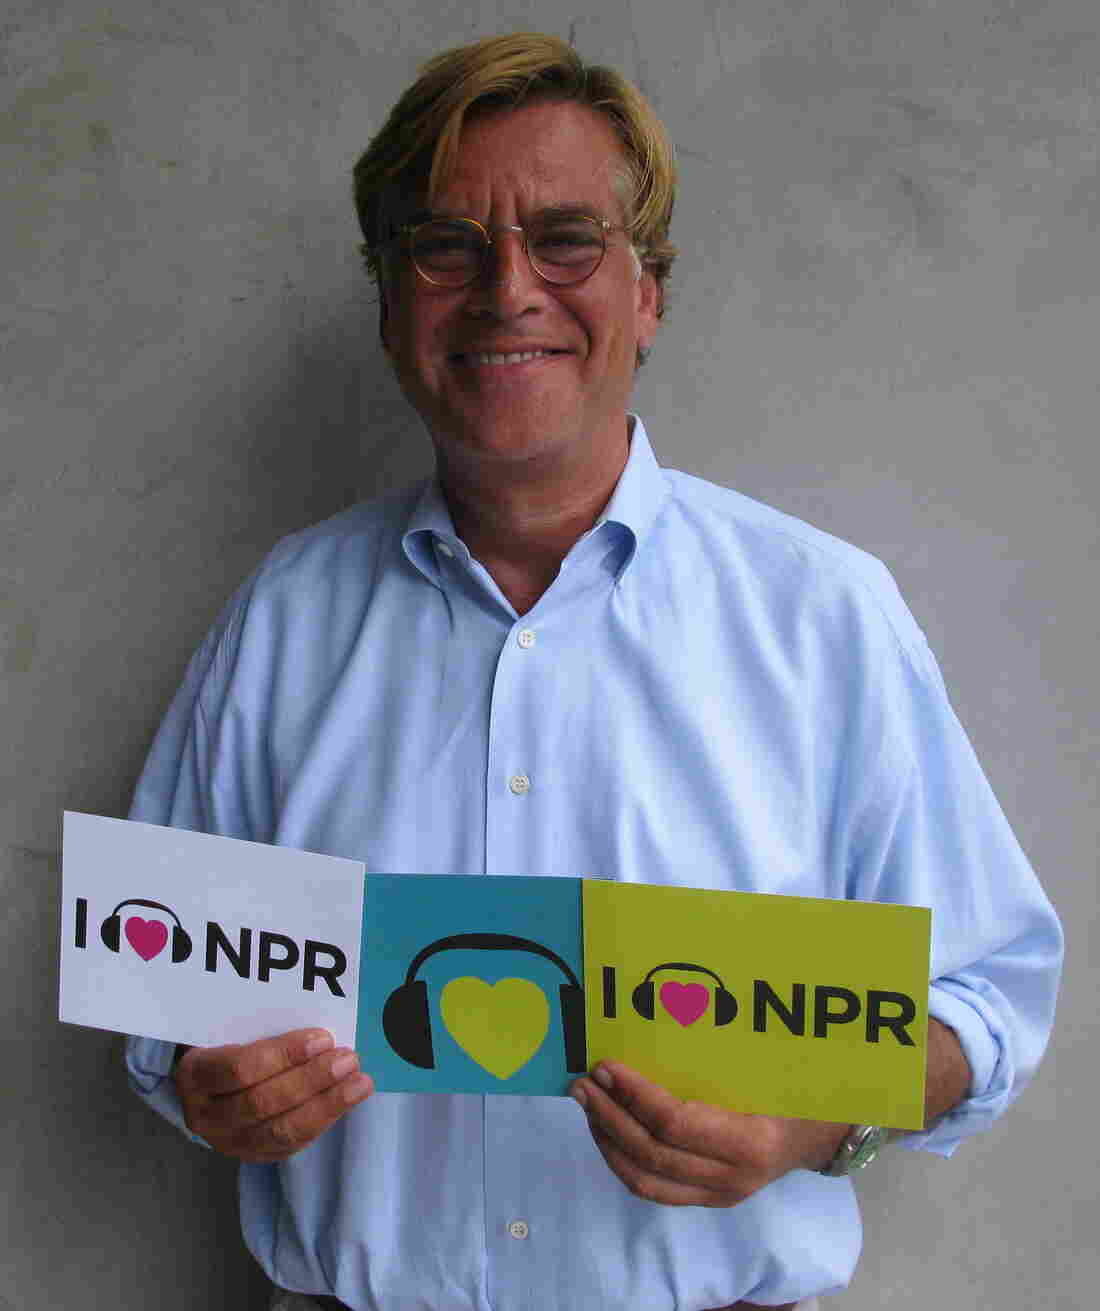 Aaron Sorkin at NPR West.